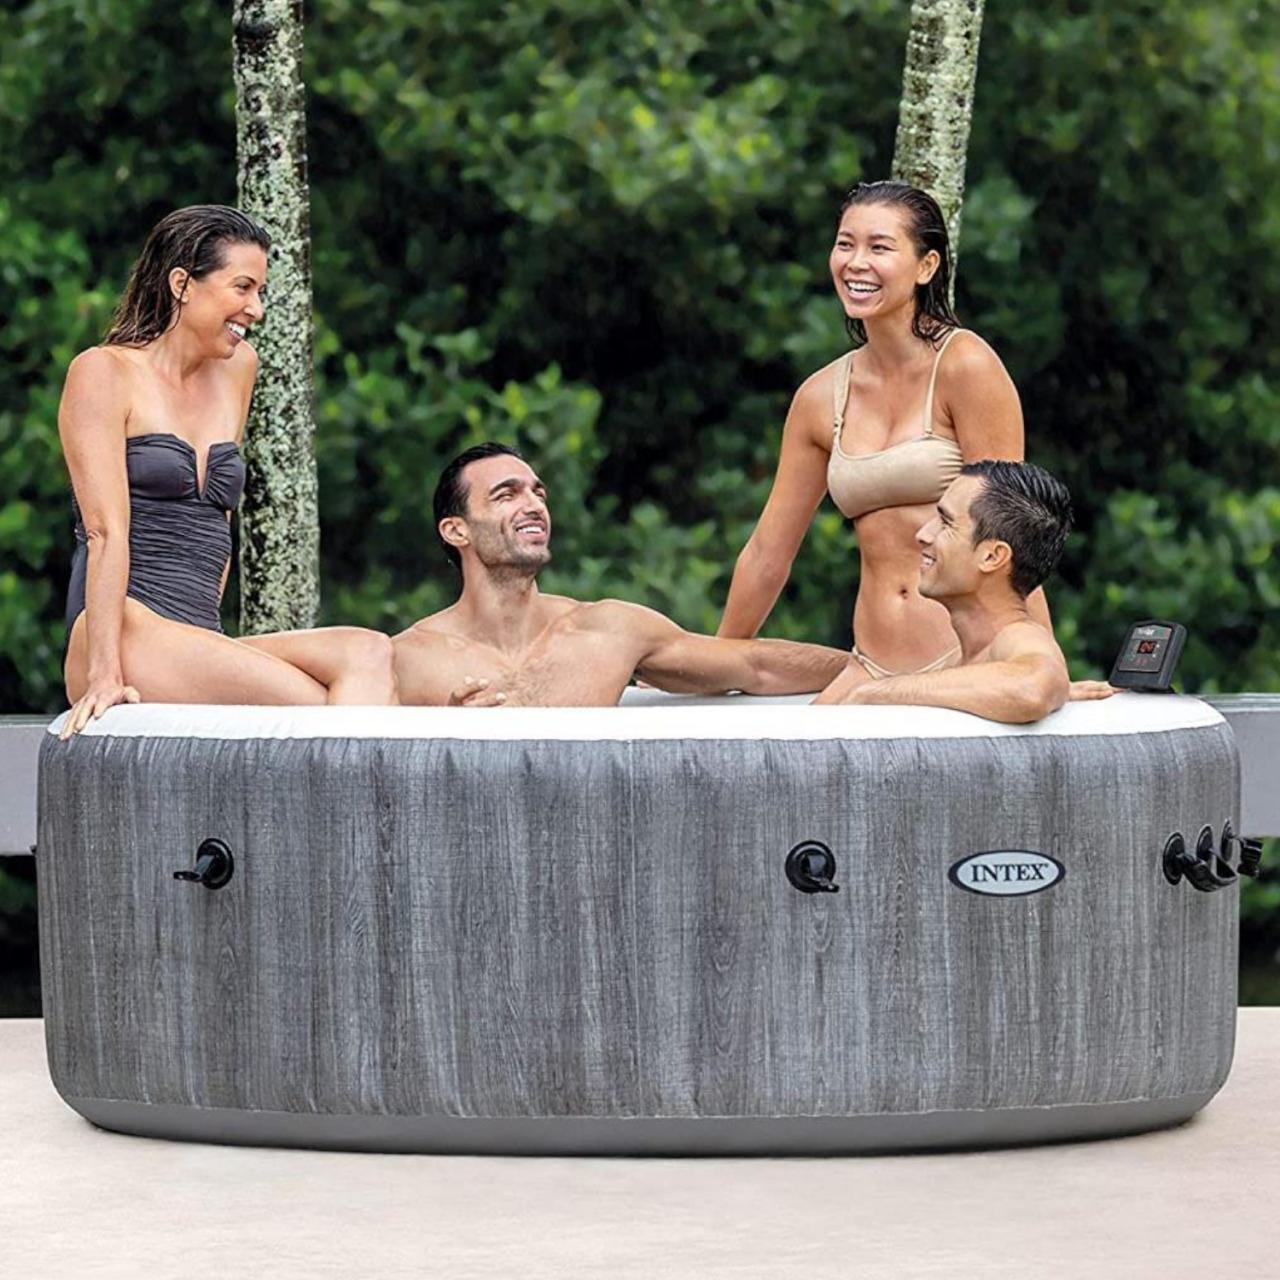 Intex 28440 Whirlpool Pure SPA Bubble Massage GreyWood 196x71 cm aufblasbar